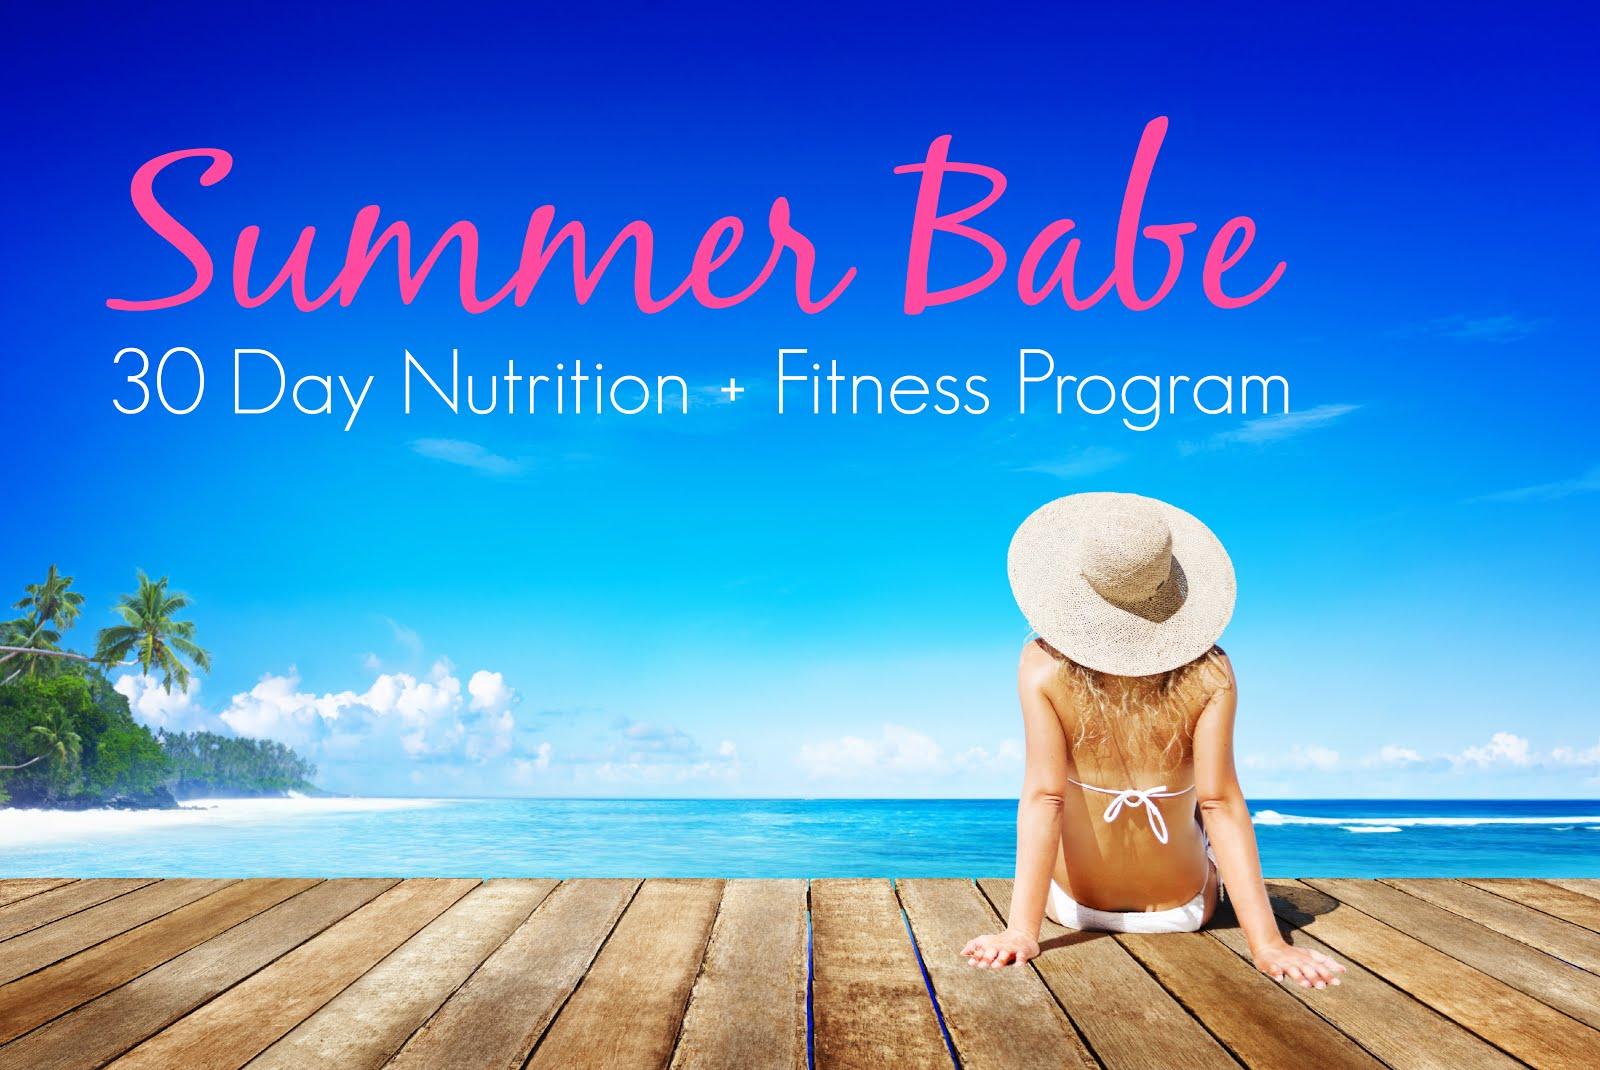 30 Day Summer Babe Program